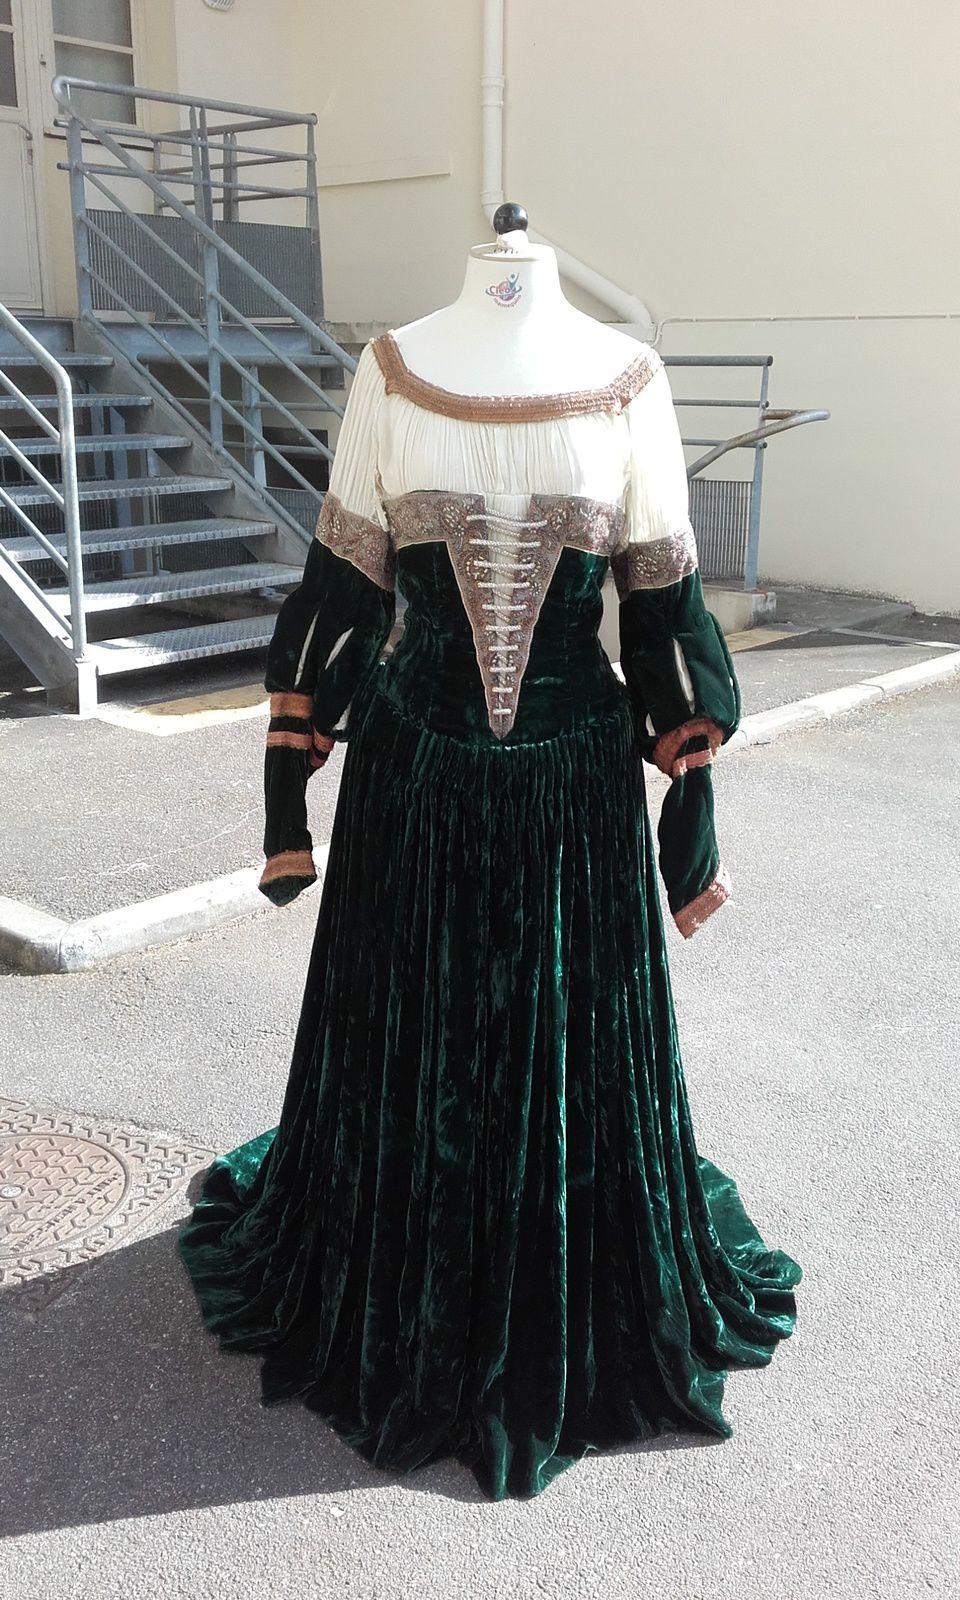 Marguerite, Faust